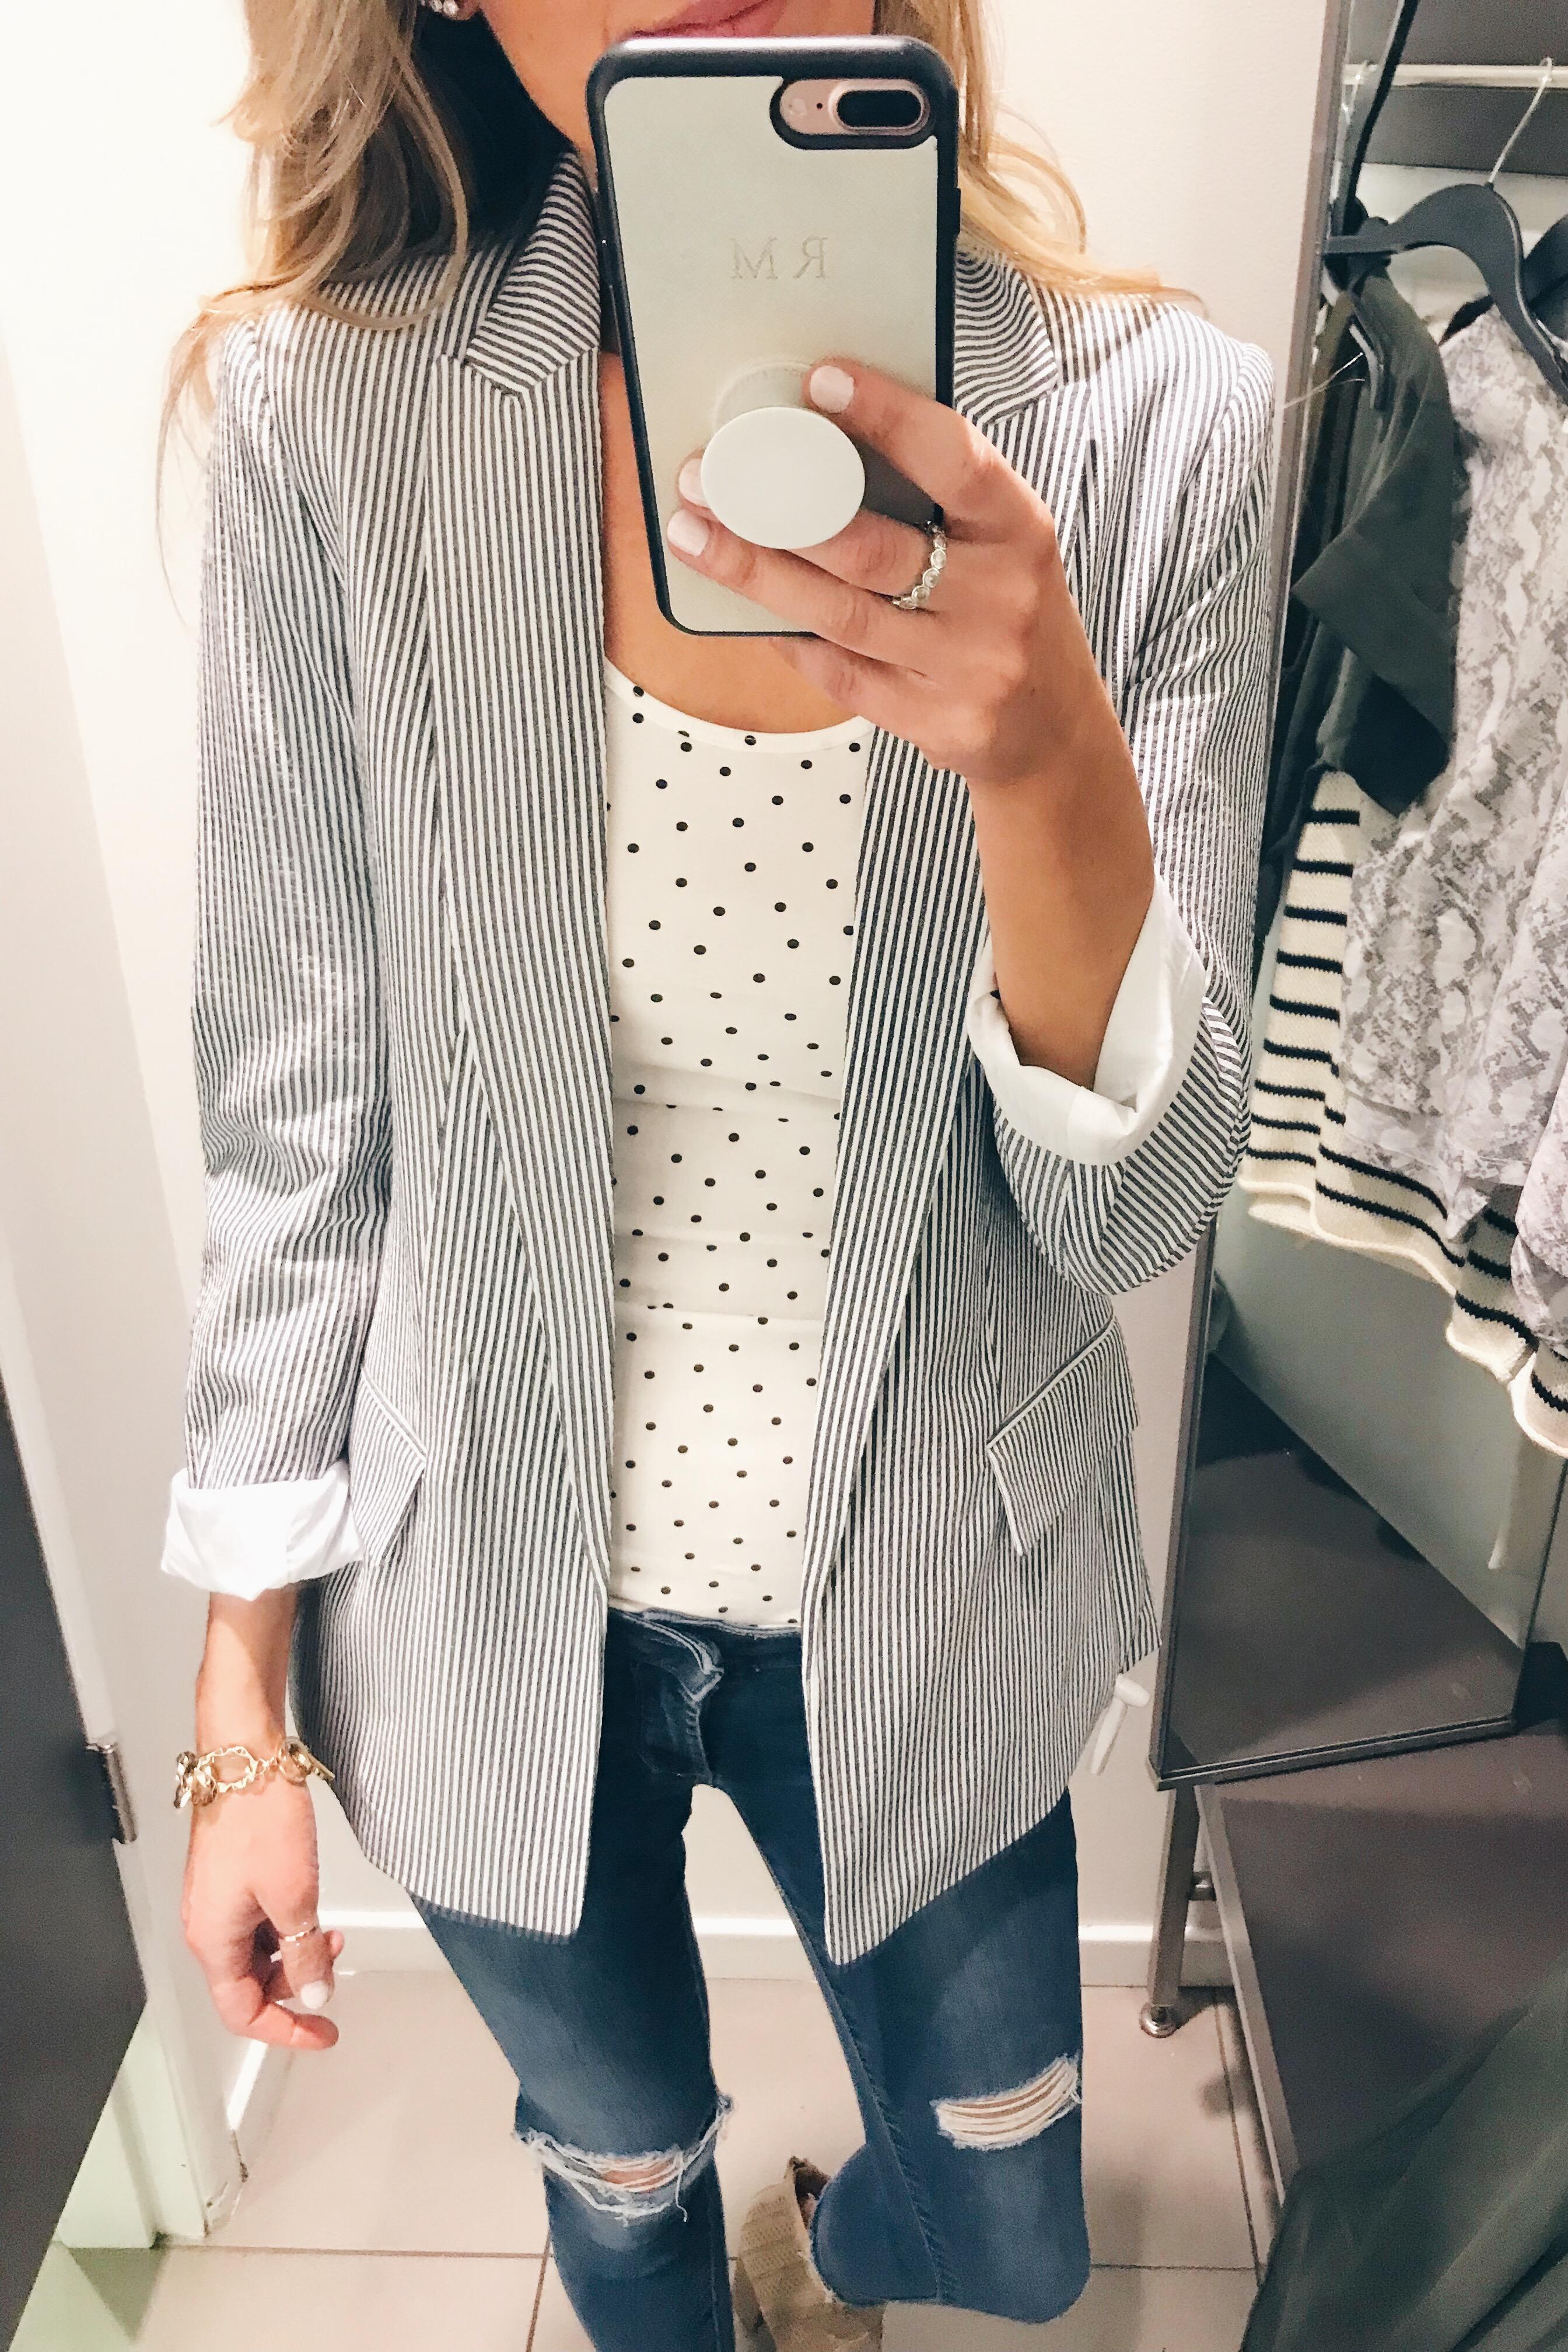 hm try on - striped blazer on Pinteresting Plans blog